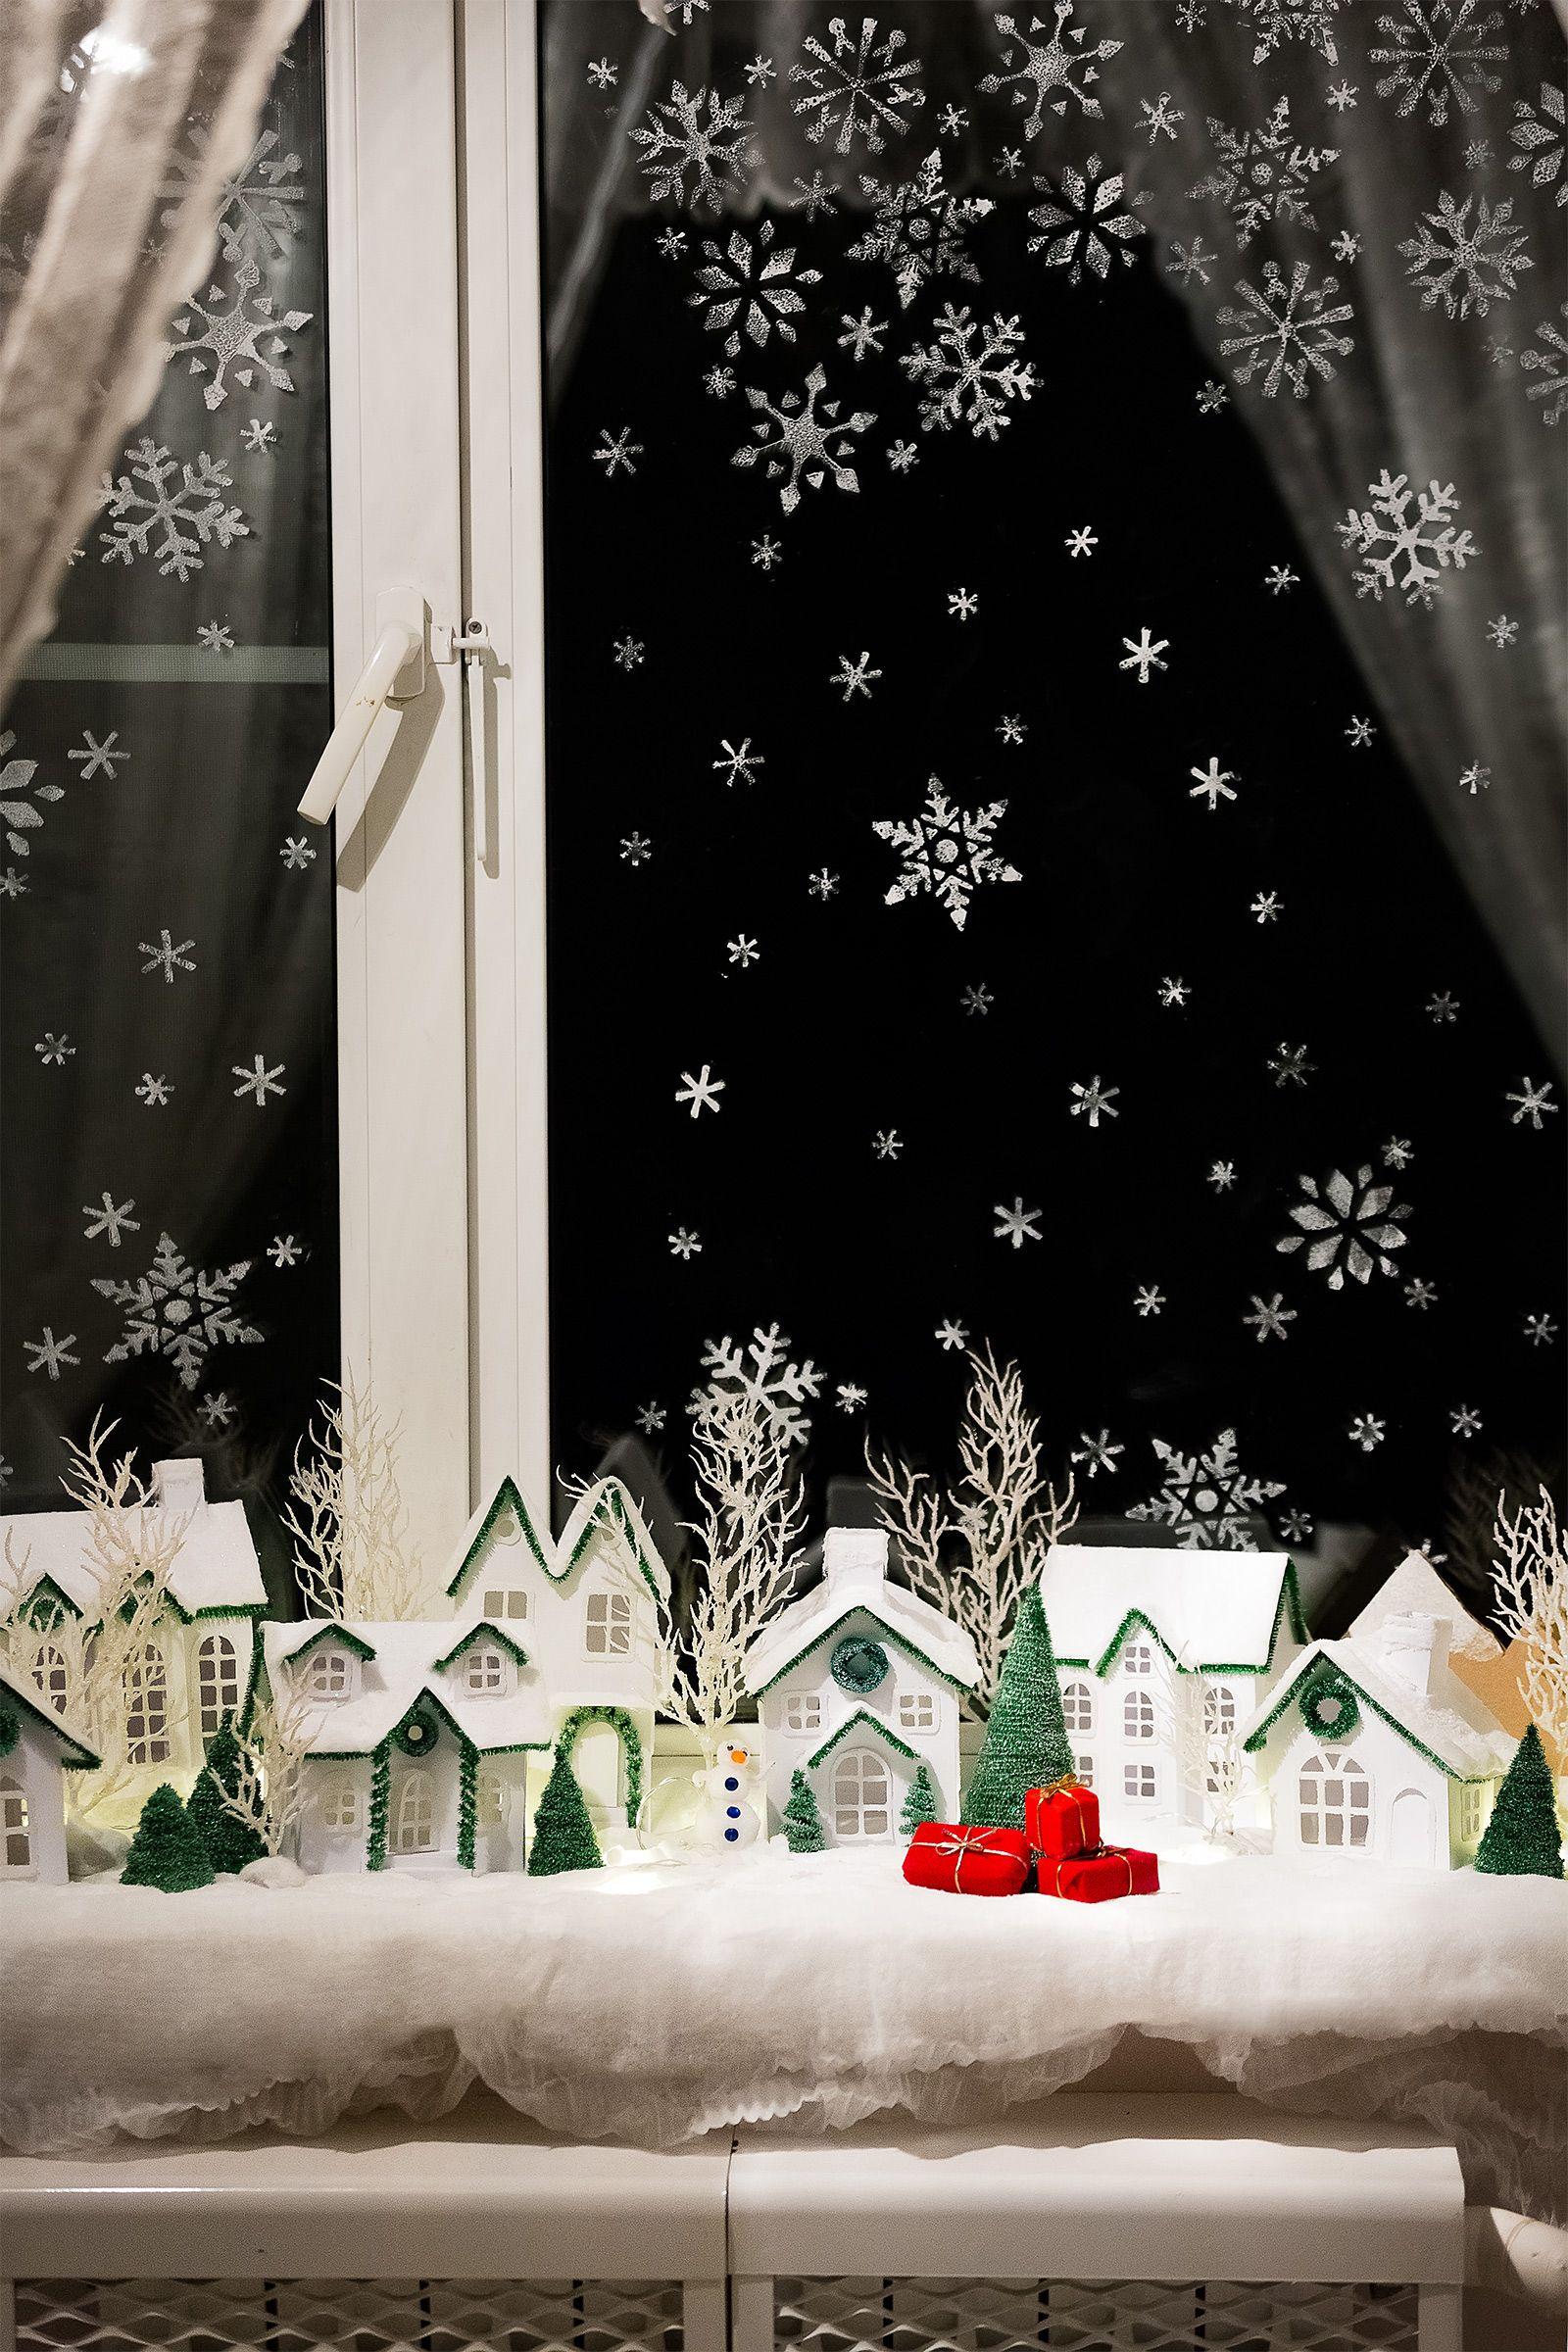 christmas house, diy paper house, christmas tree, advent ...